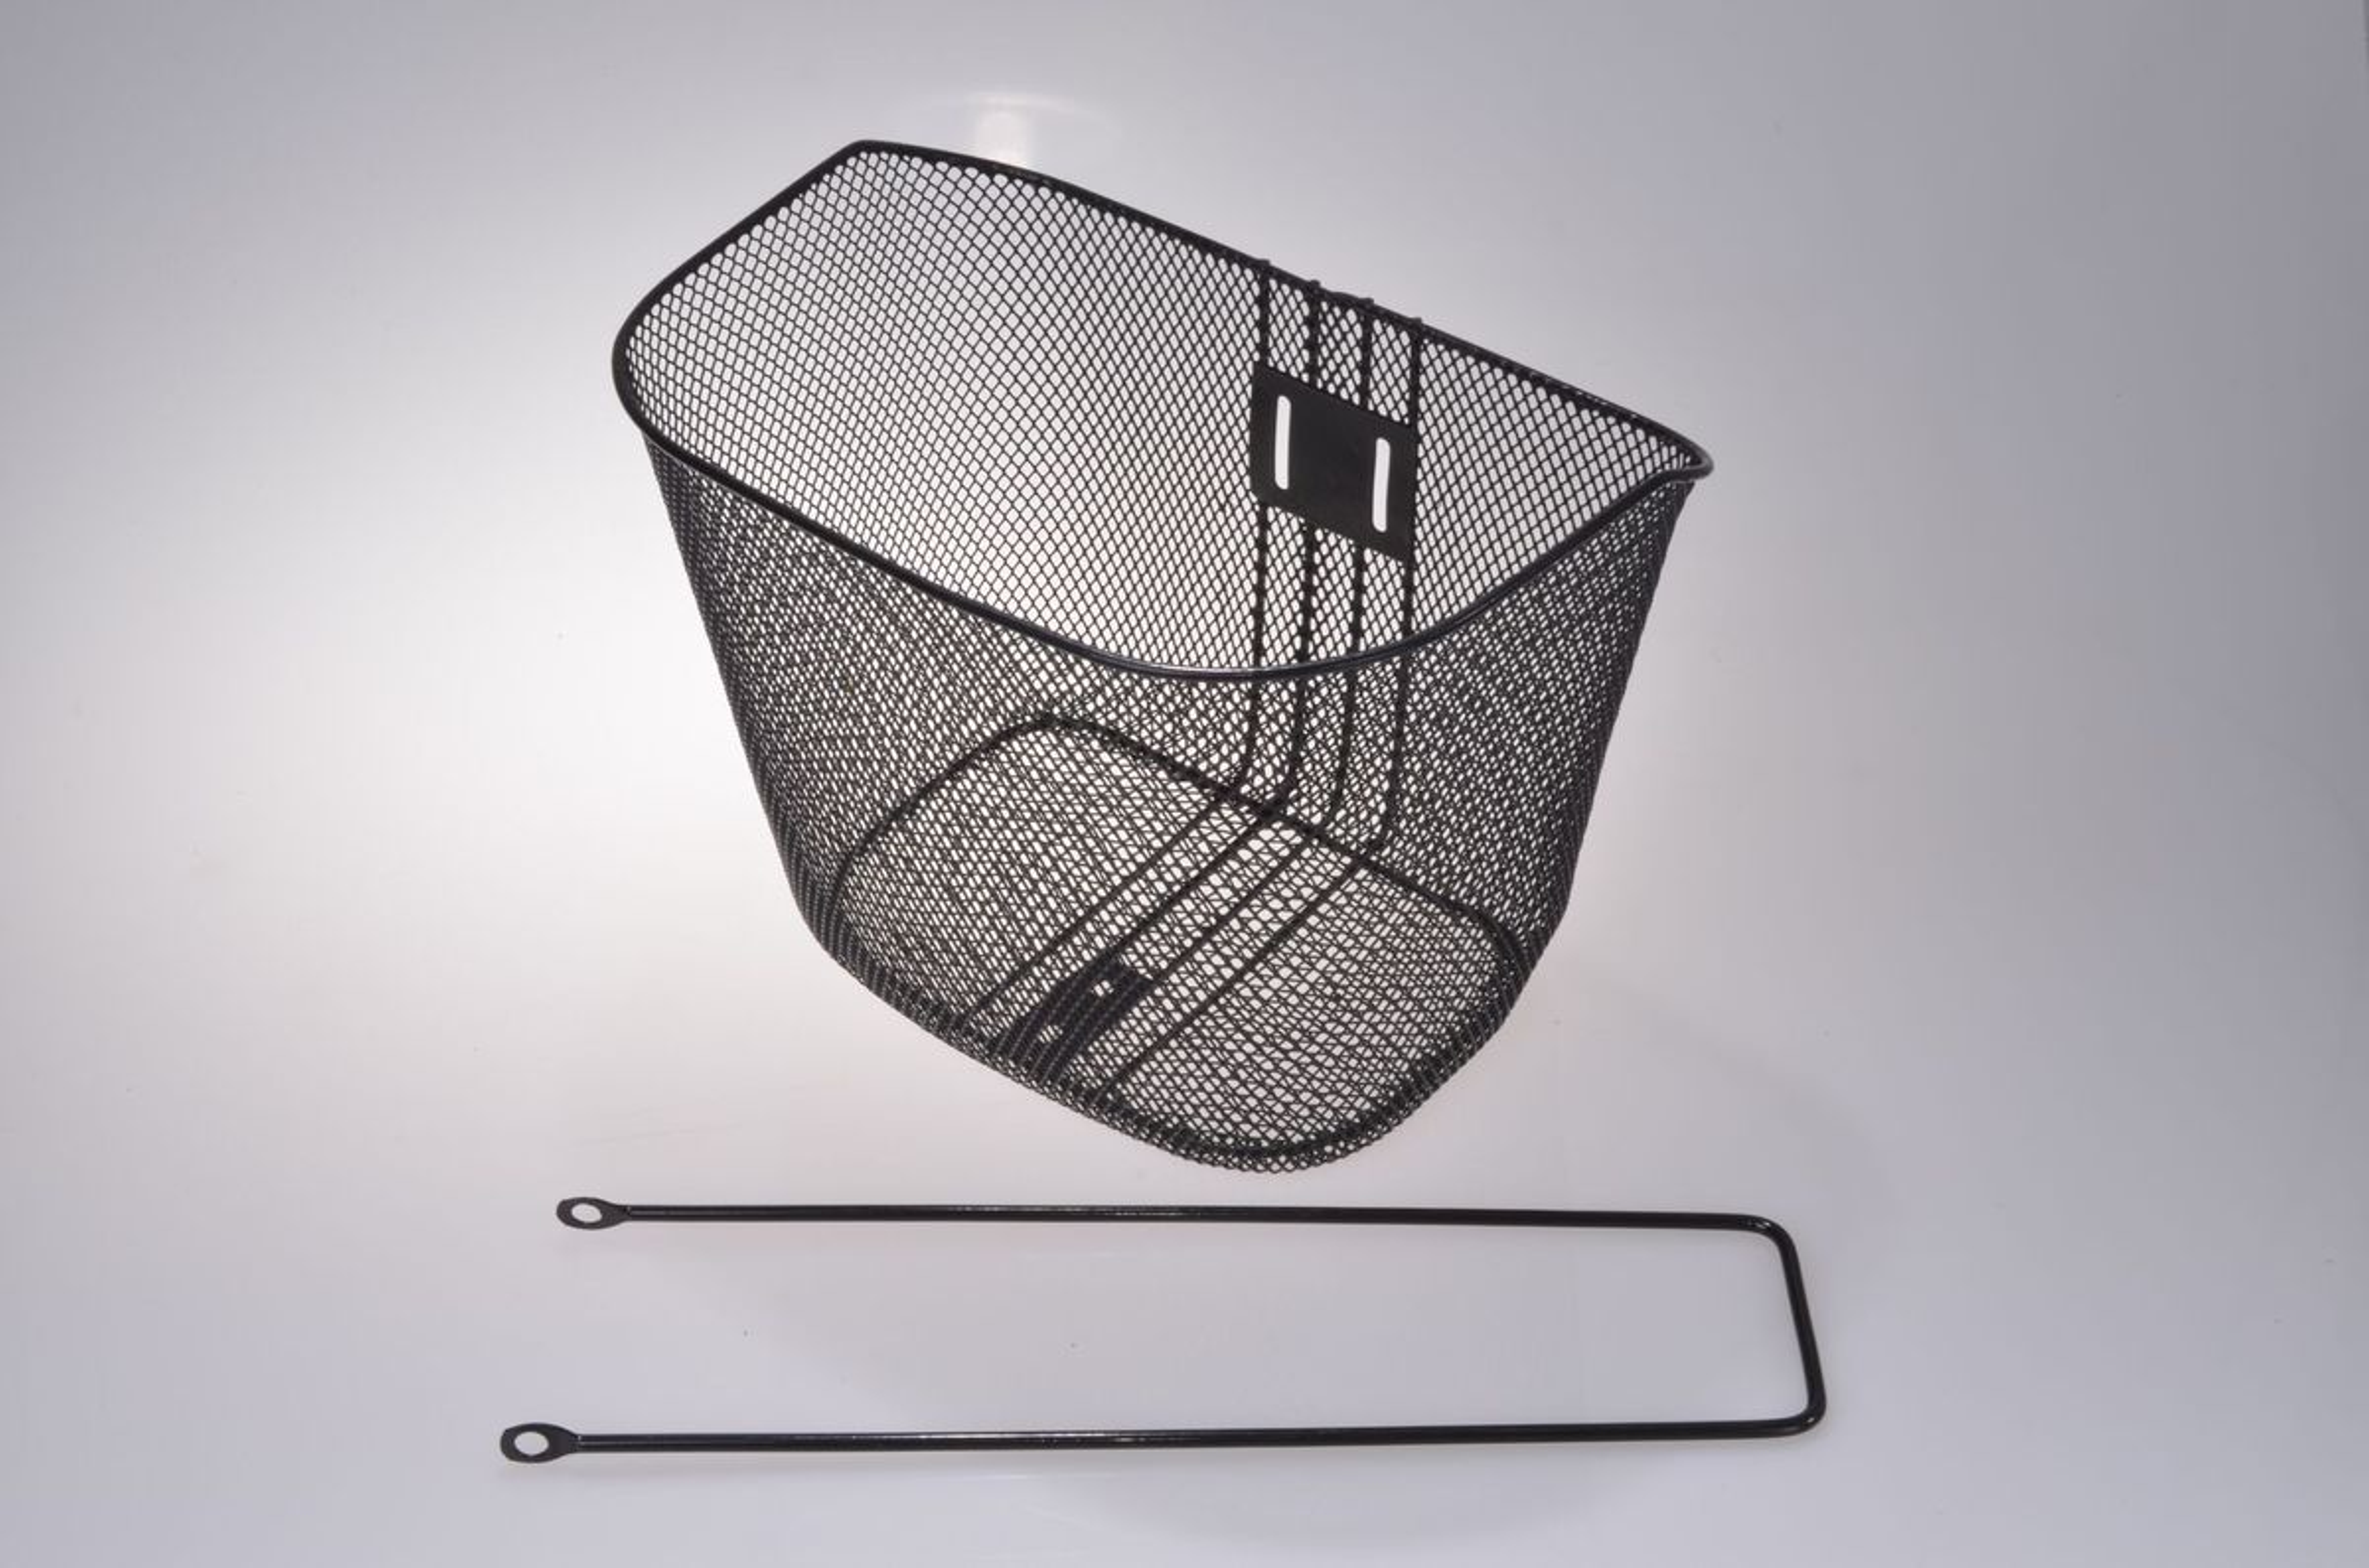 metallkorb schwarz top full size of metall glas schwarz. Black Bedroom Furniture Sets. Home Design Ideas